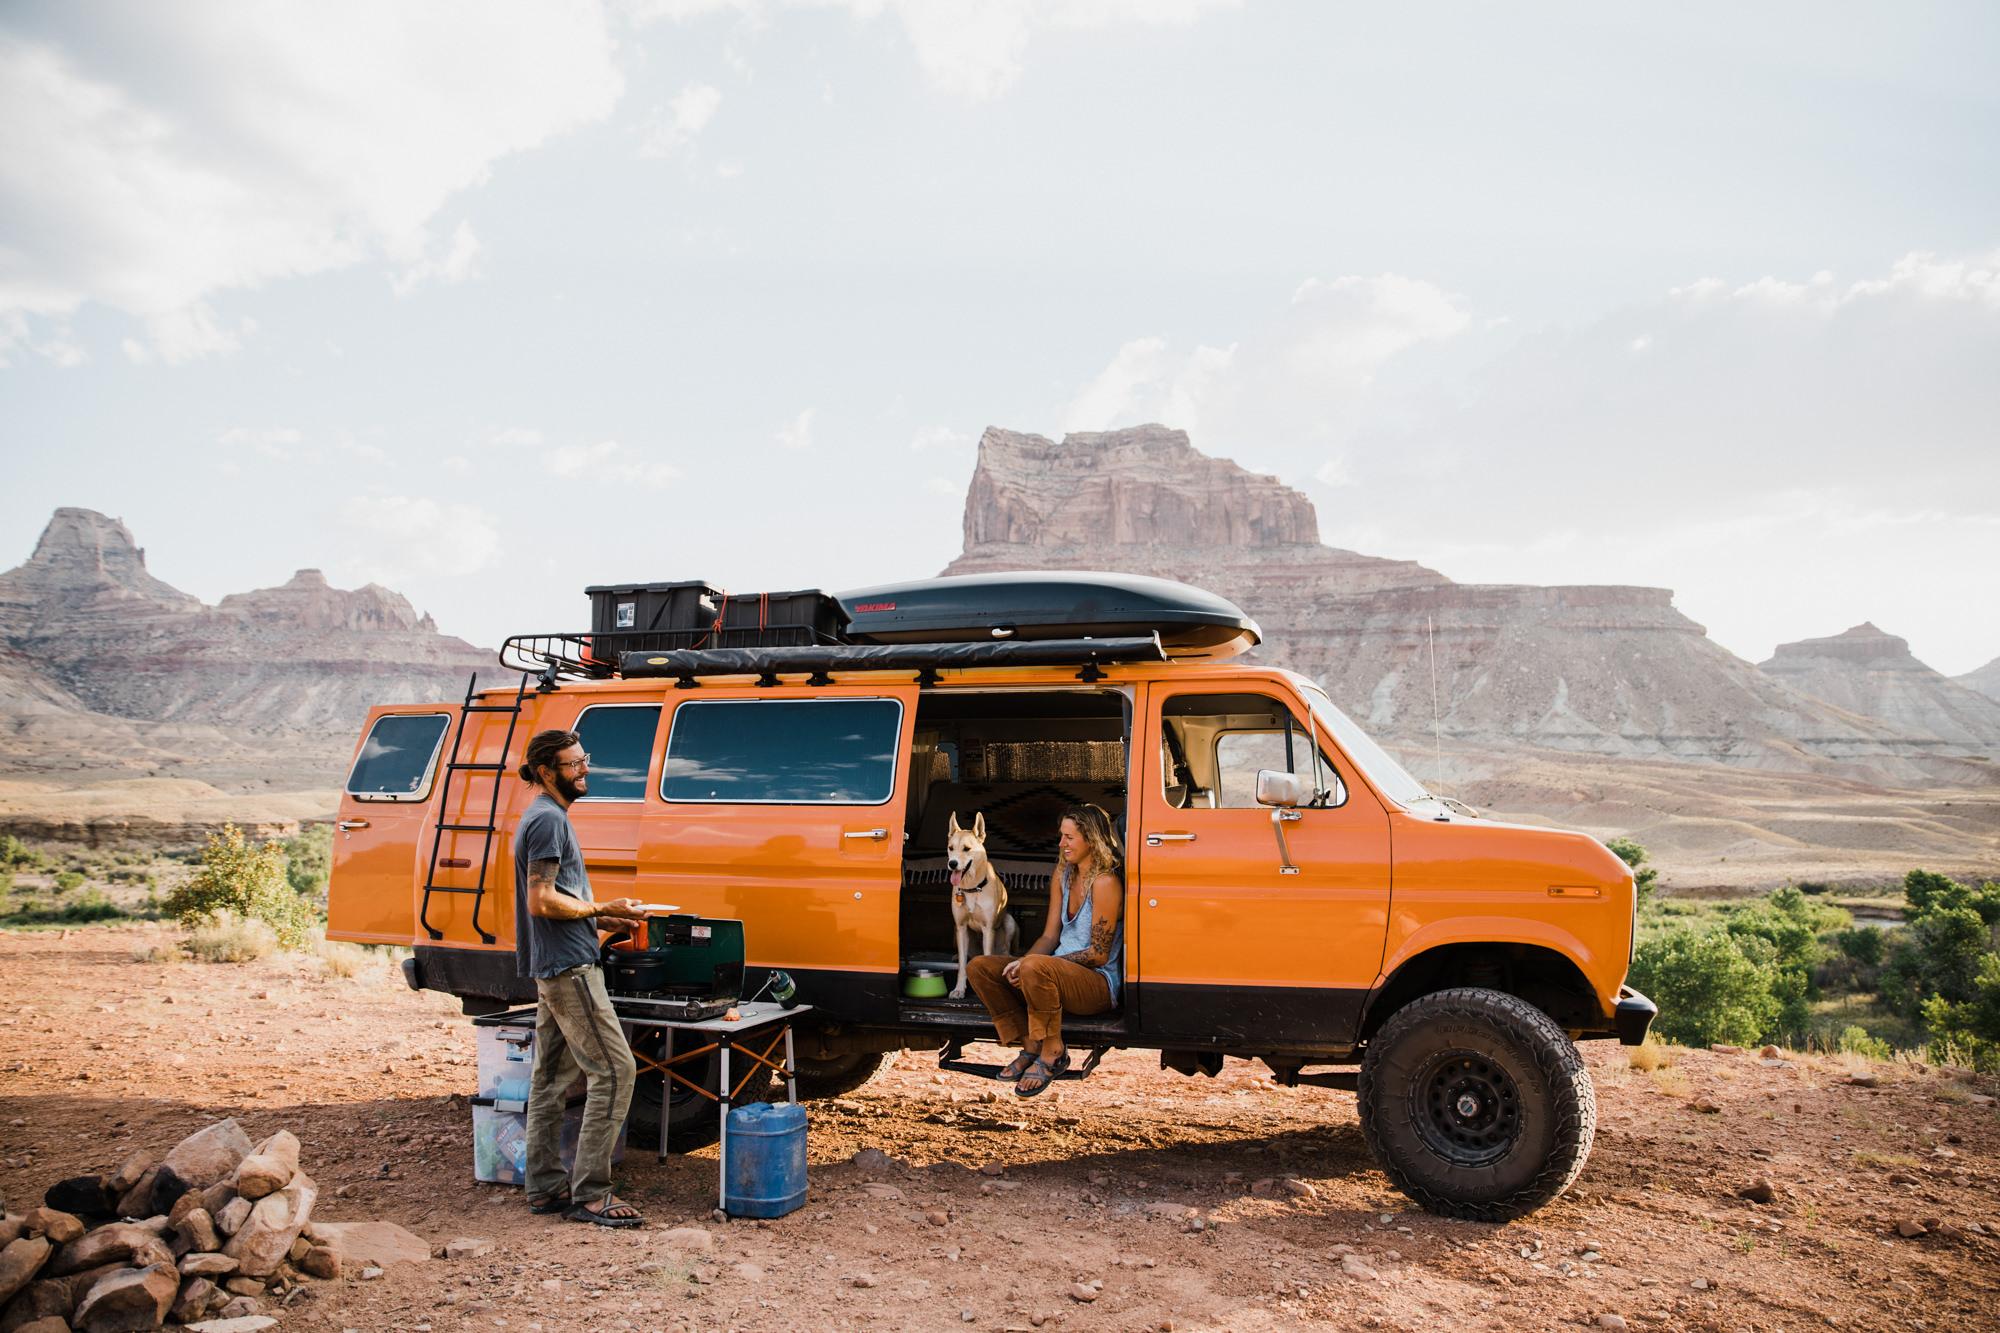 adventurous van life session in the utah desert | destination engagement photo inspiration | utah adventure elopement photographers | the hearnes adventure photography | www.thehearnes.com